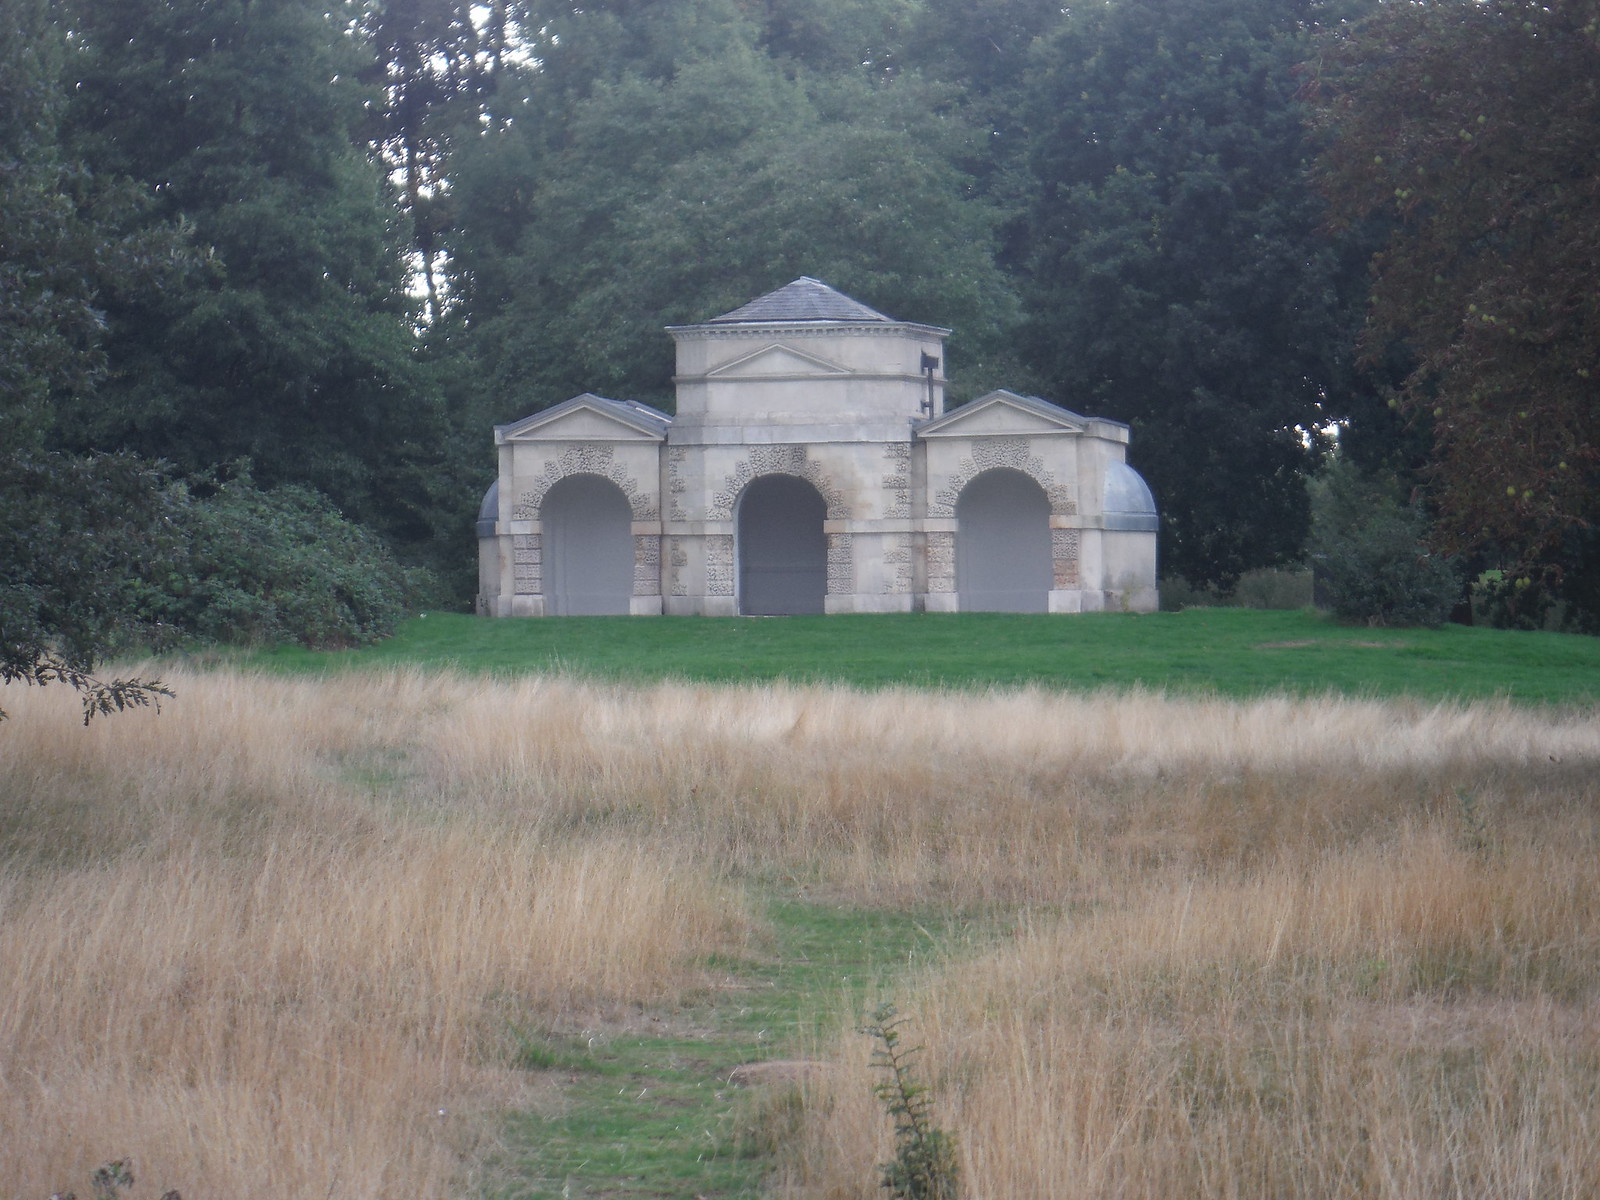 Building in Kensington Gardens SWC Short Walk 19 - Royal Parks